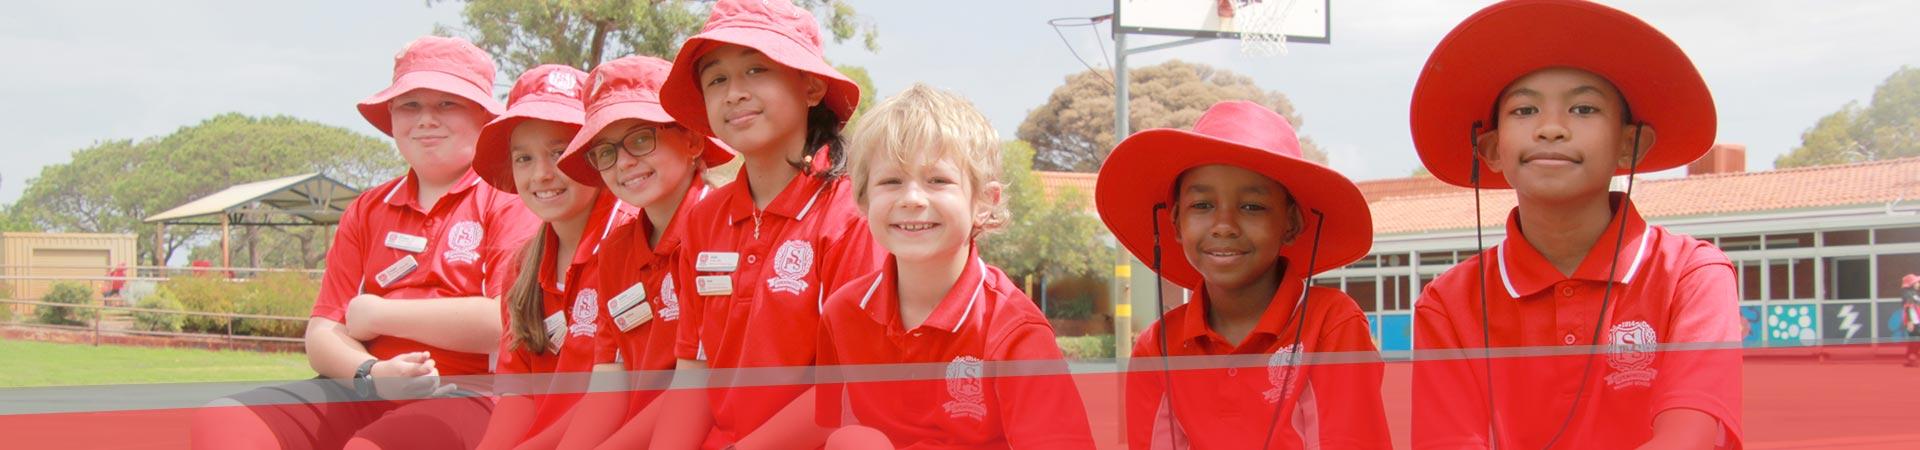 SCHOOL BUSINESS PLAN spearwood primary school